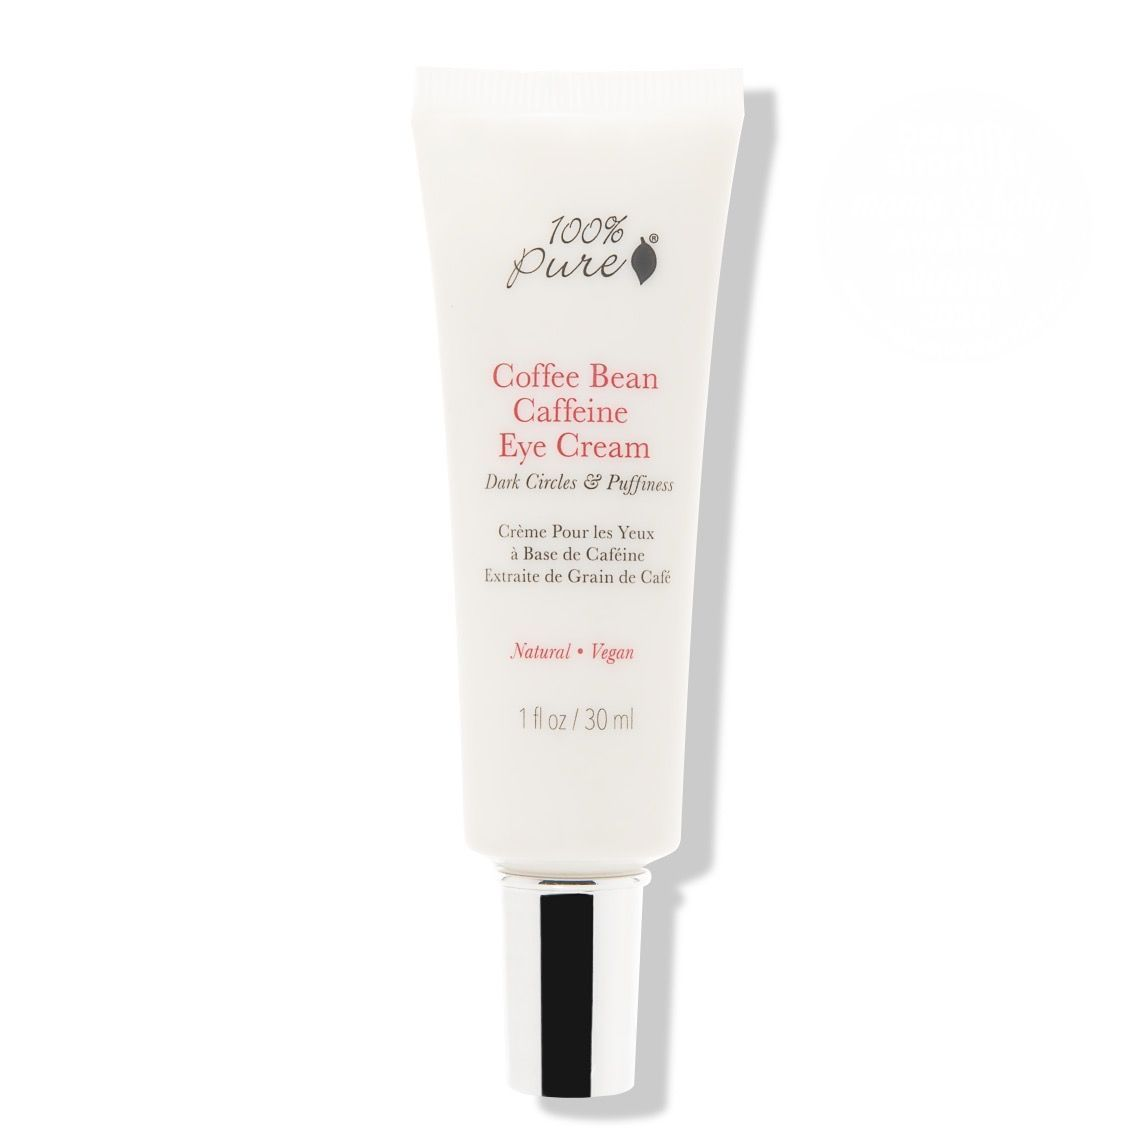 Coffee Bean Caffeine Eye Cream